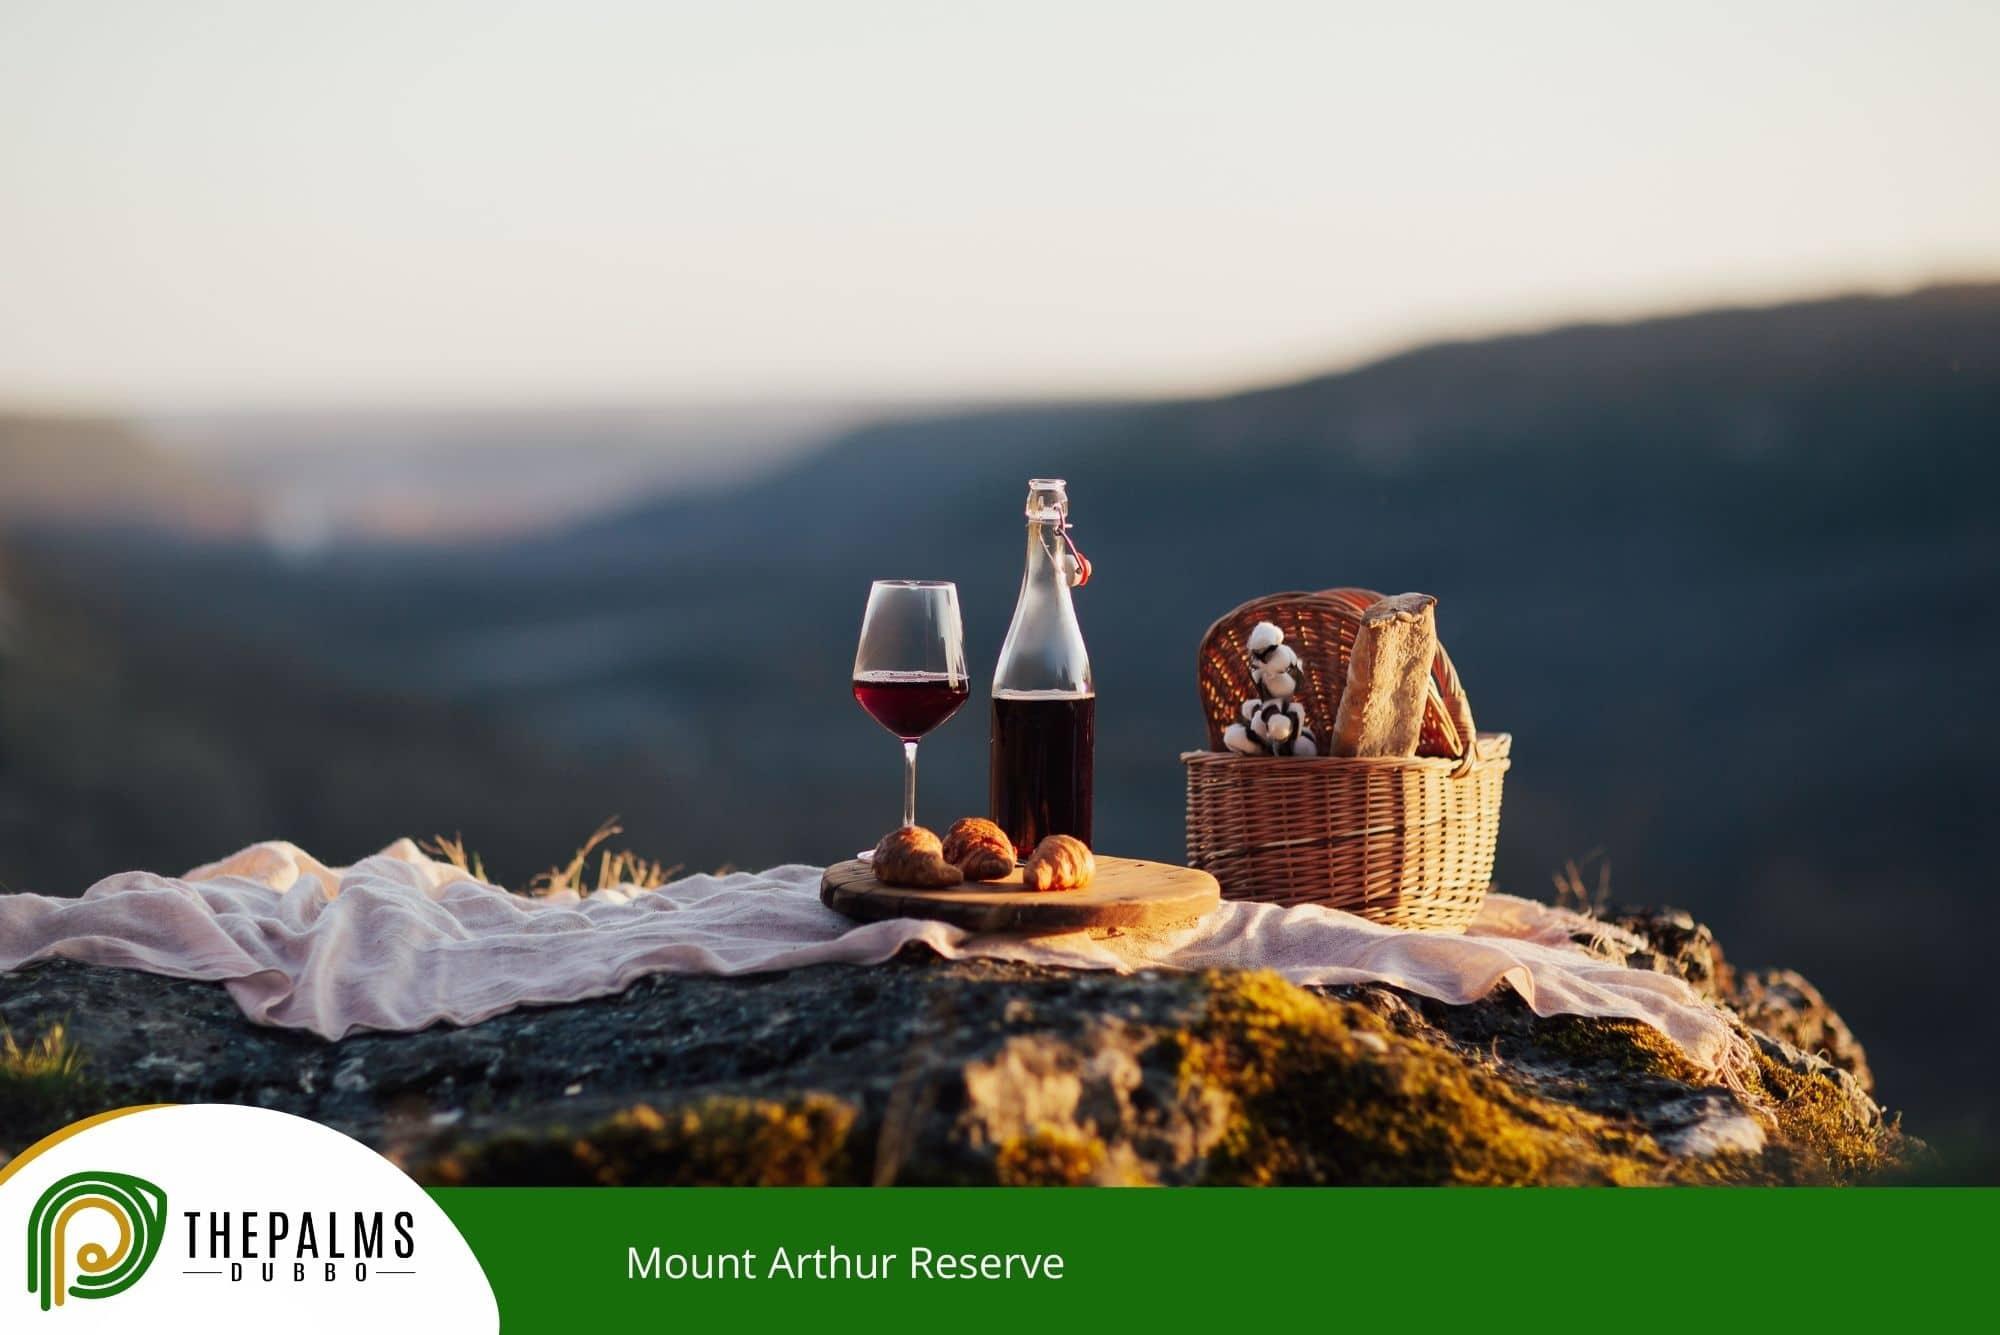 Mount Arthur Reserve